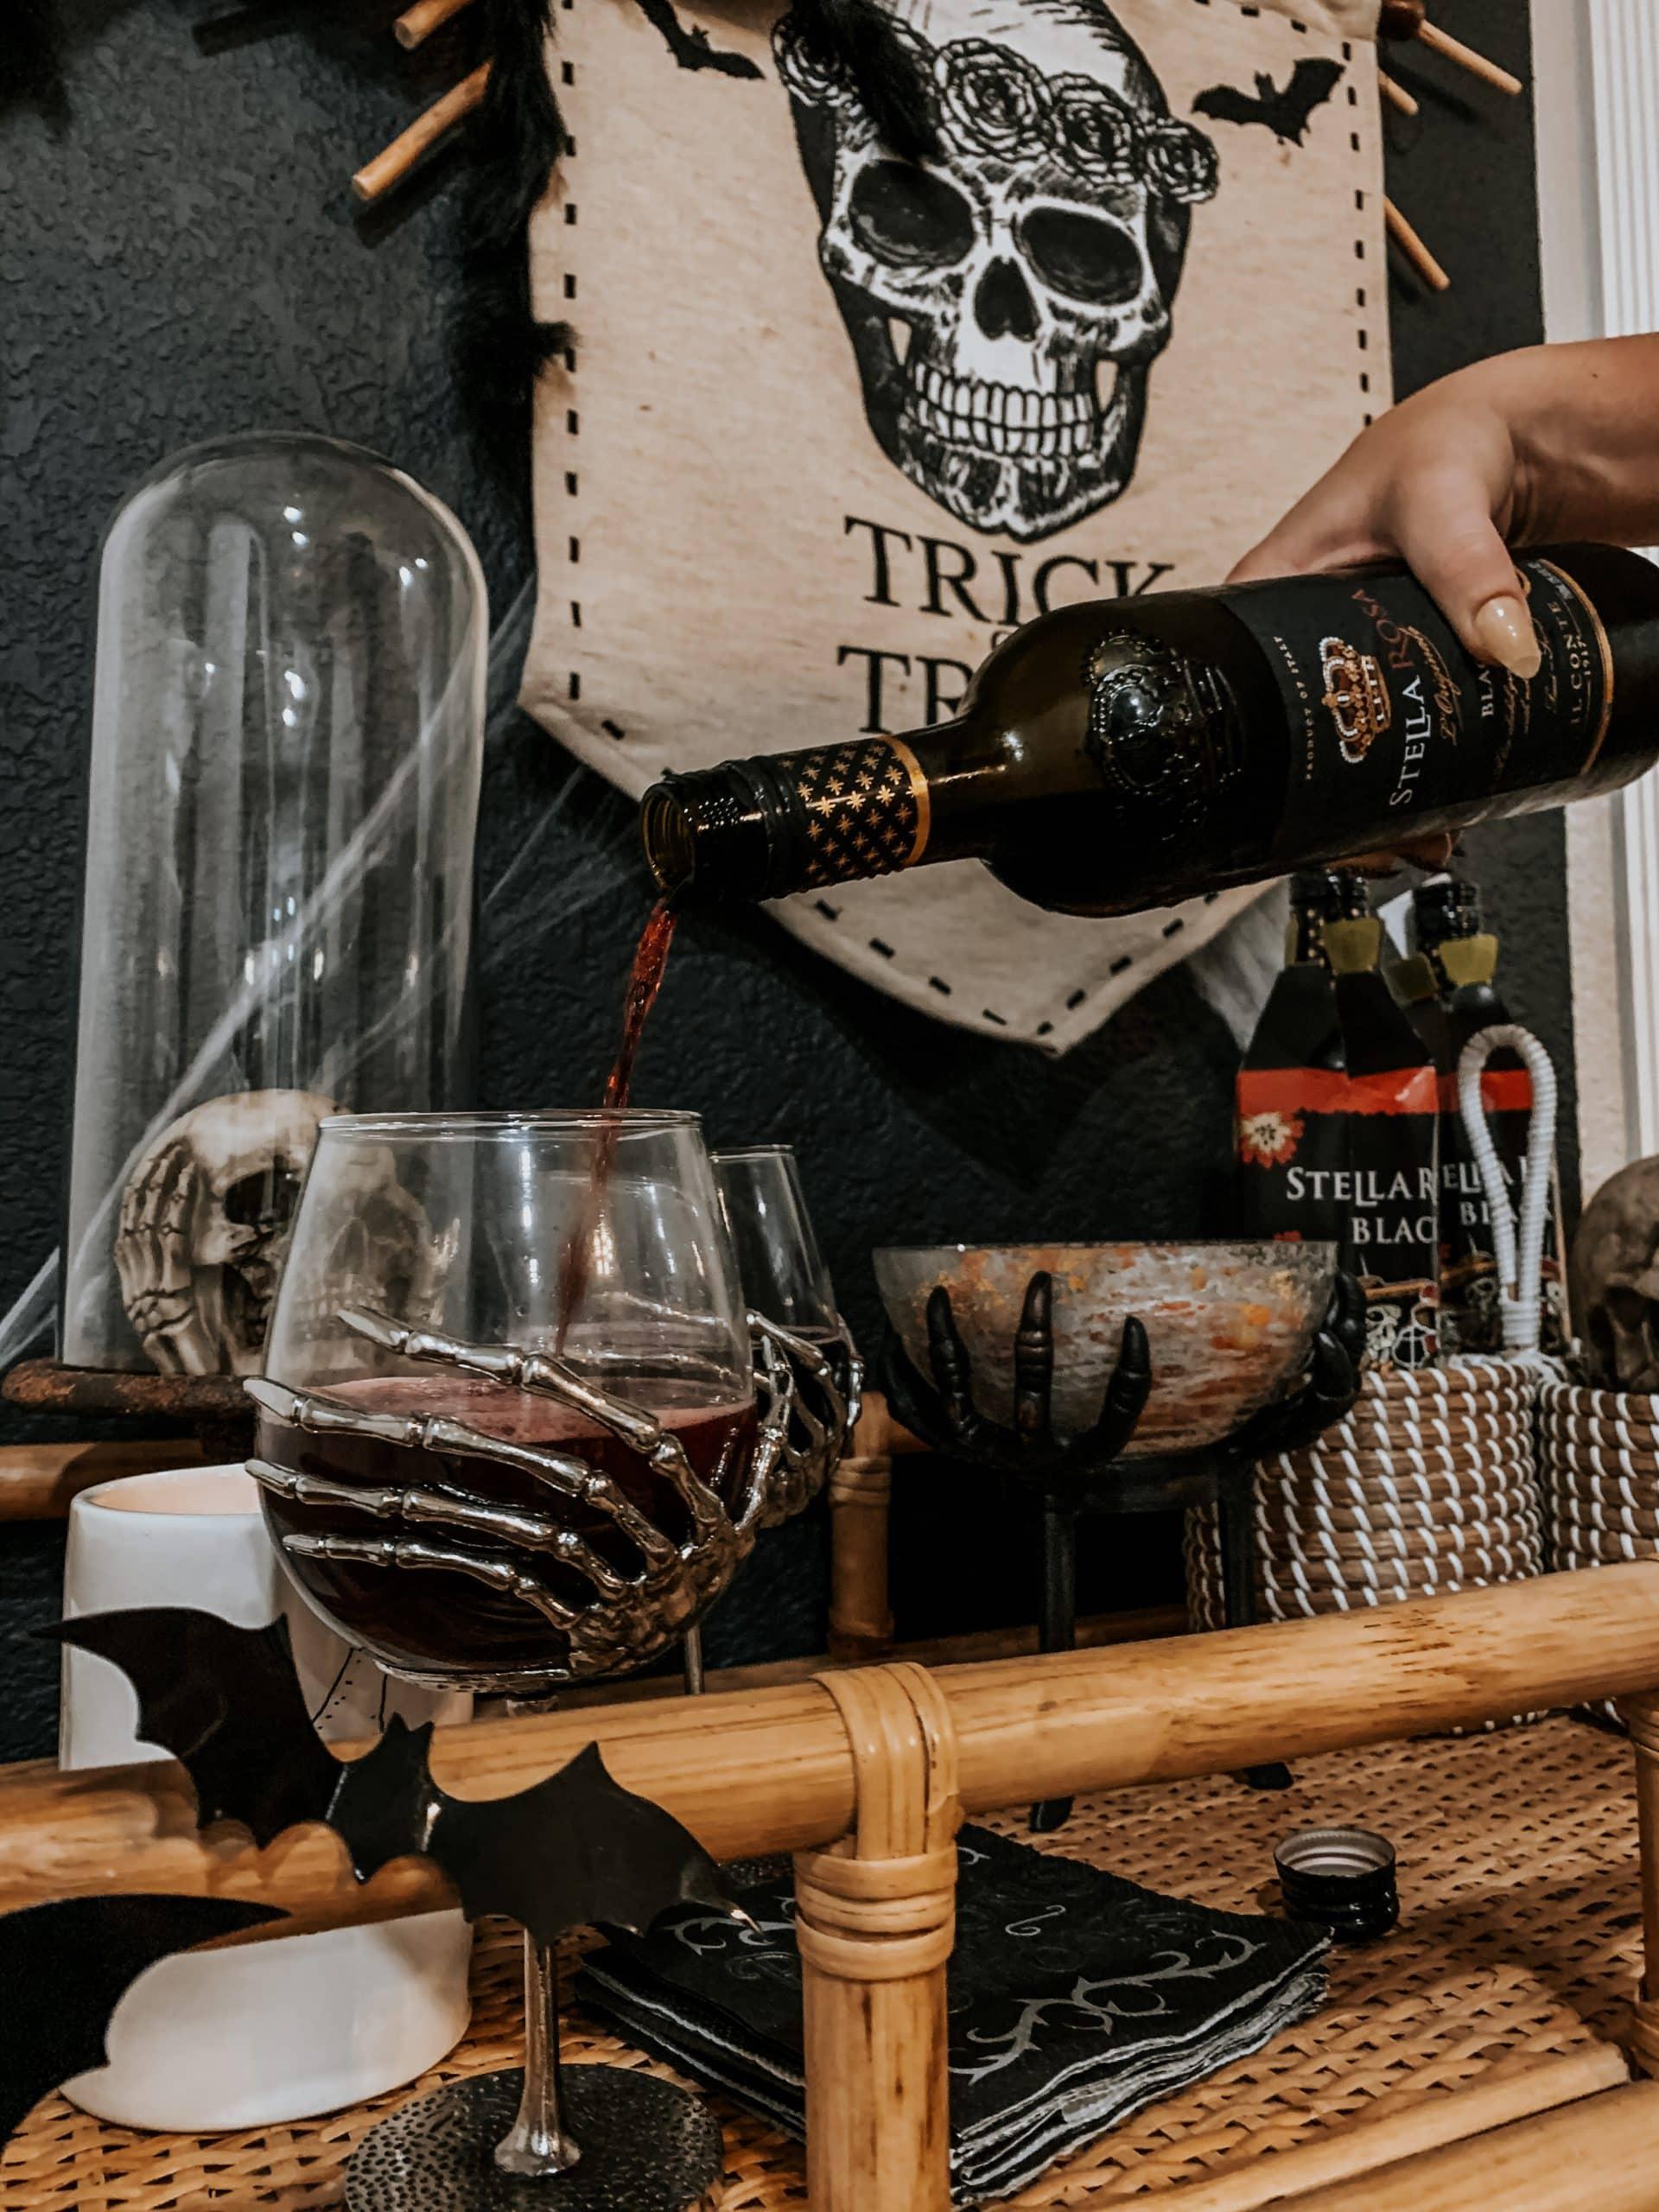 Stella Rosa Black Halloween Wine Bottles